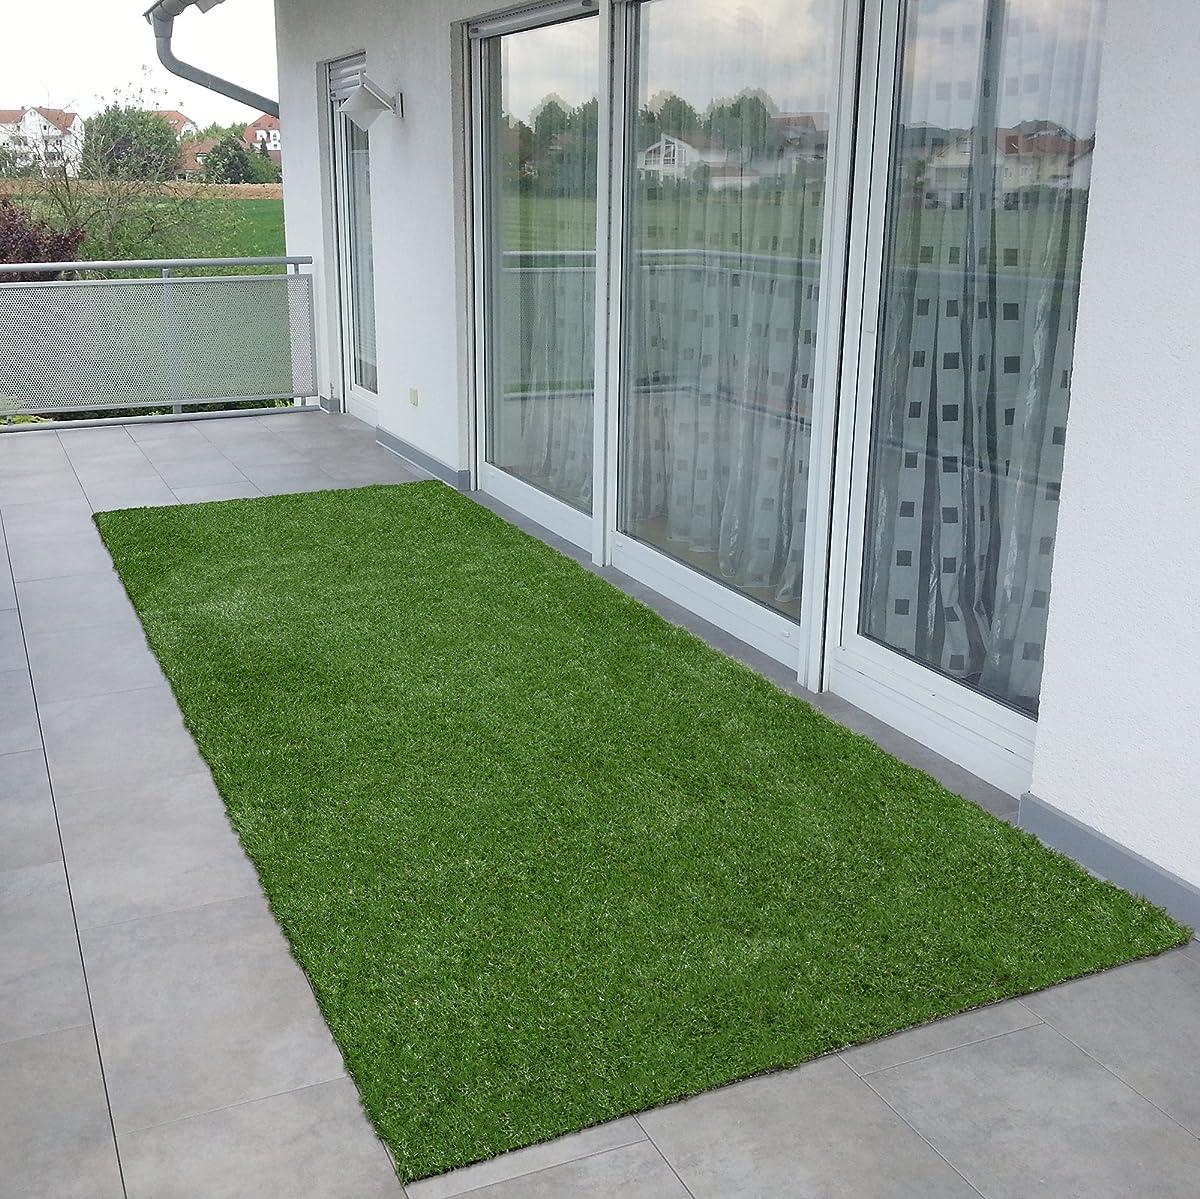 "Ottomanson Garden Collection Solid Grass Design Runner Rug, 20"" x 59"", Green"